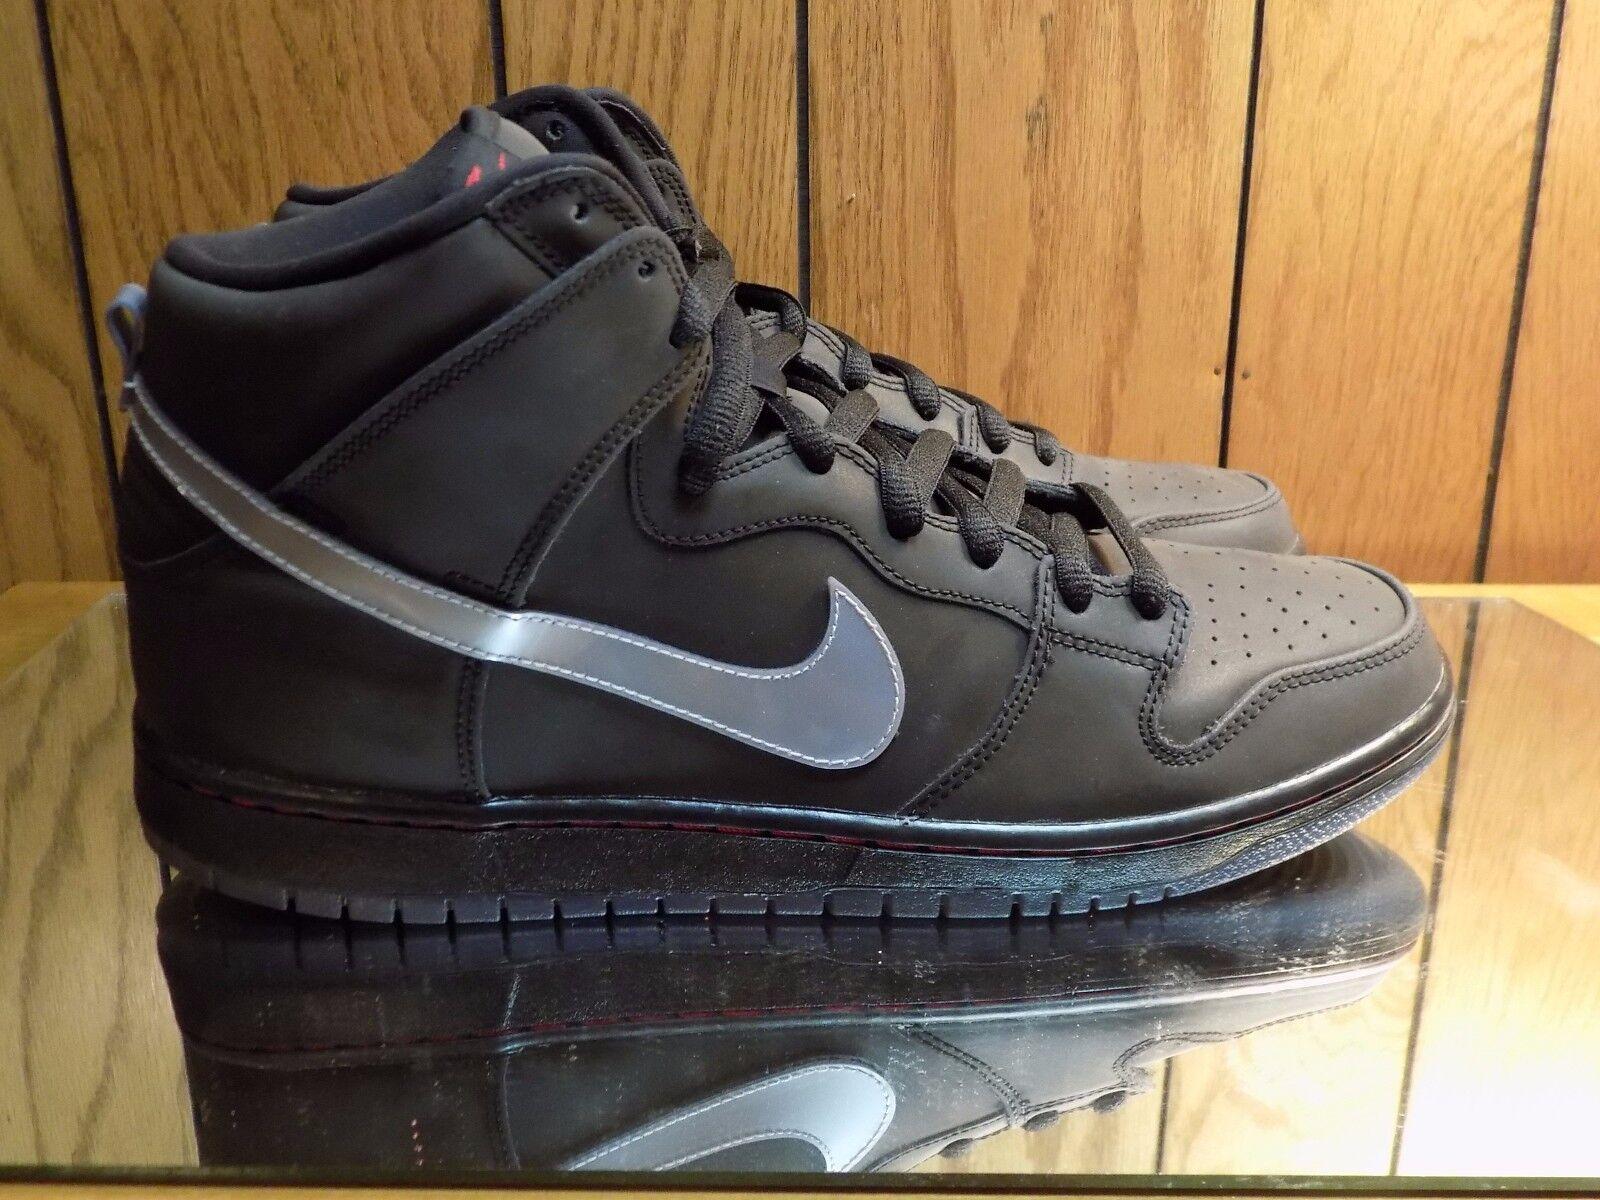 New DS Nike Dunk High SB QS Quickstrike Raging Bull 3M Black s. 14 sneaker